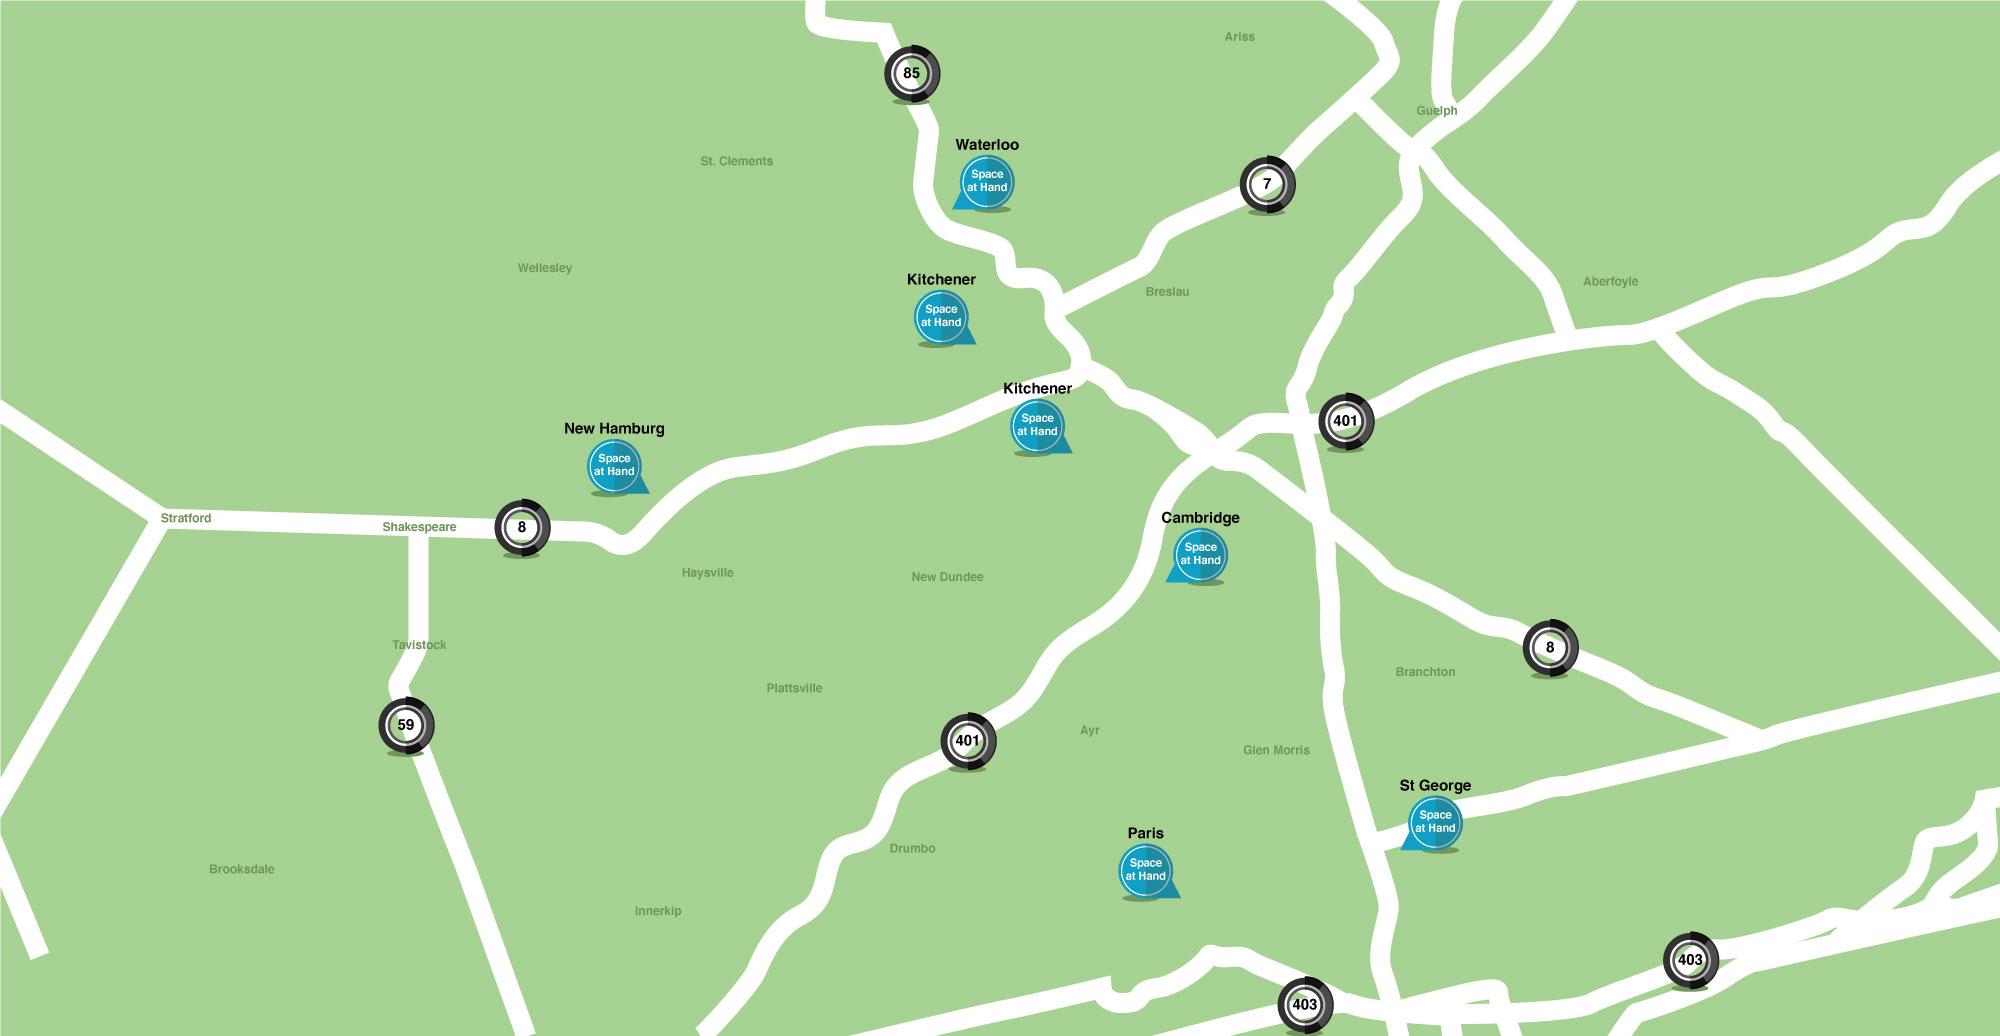 Kitchener Paris New Hamburg Waterloo Cambridge